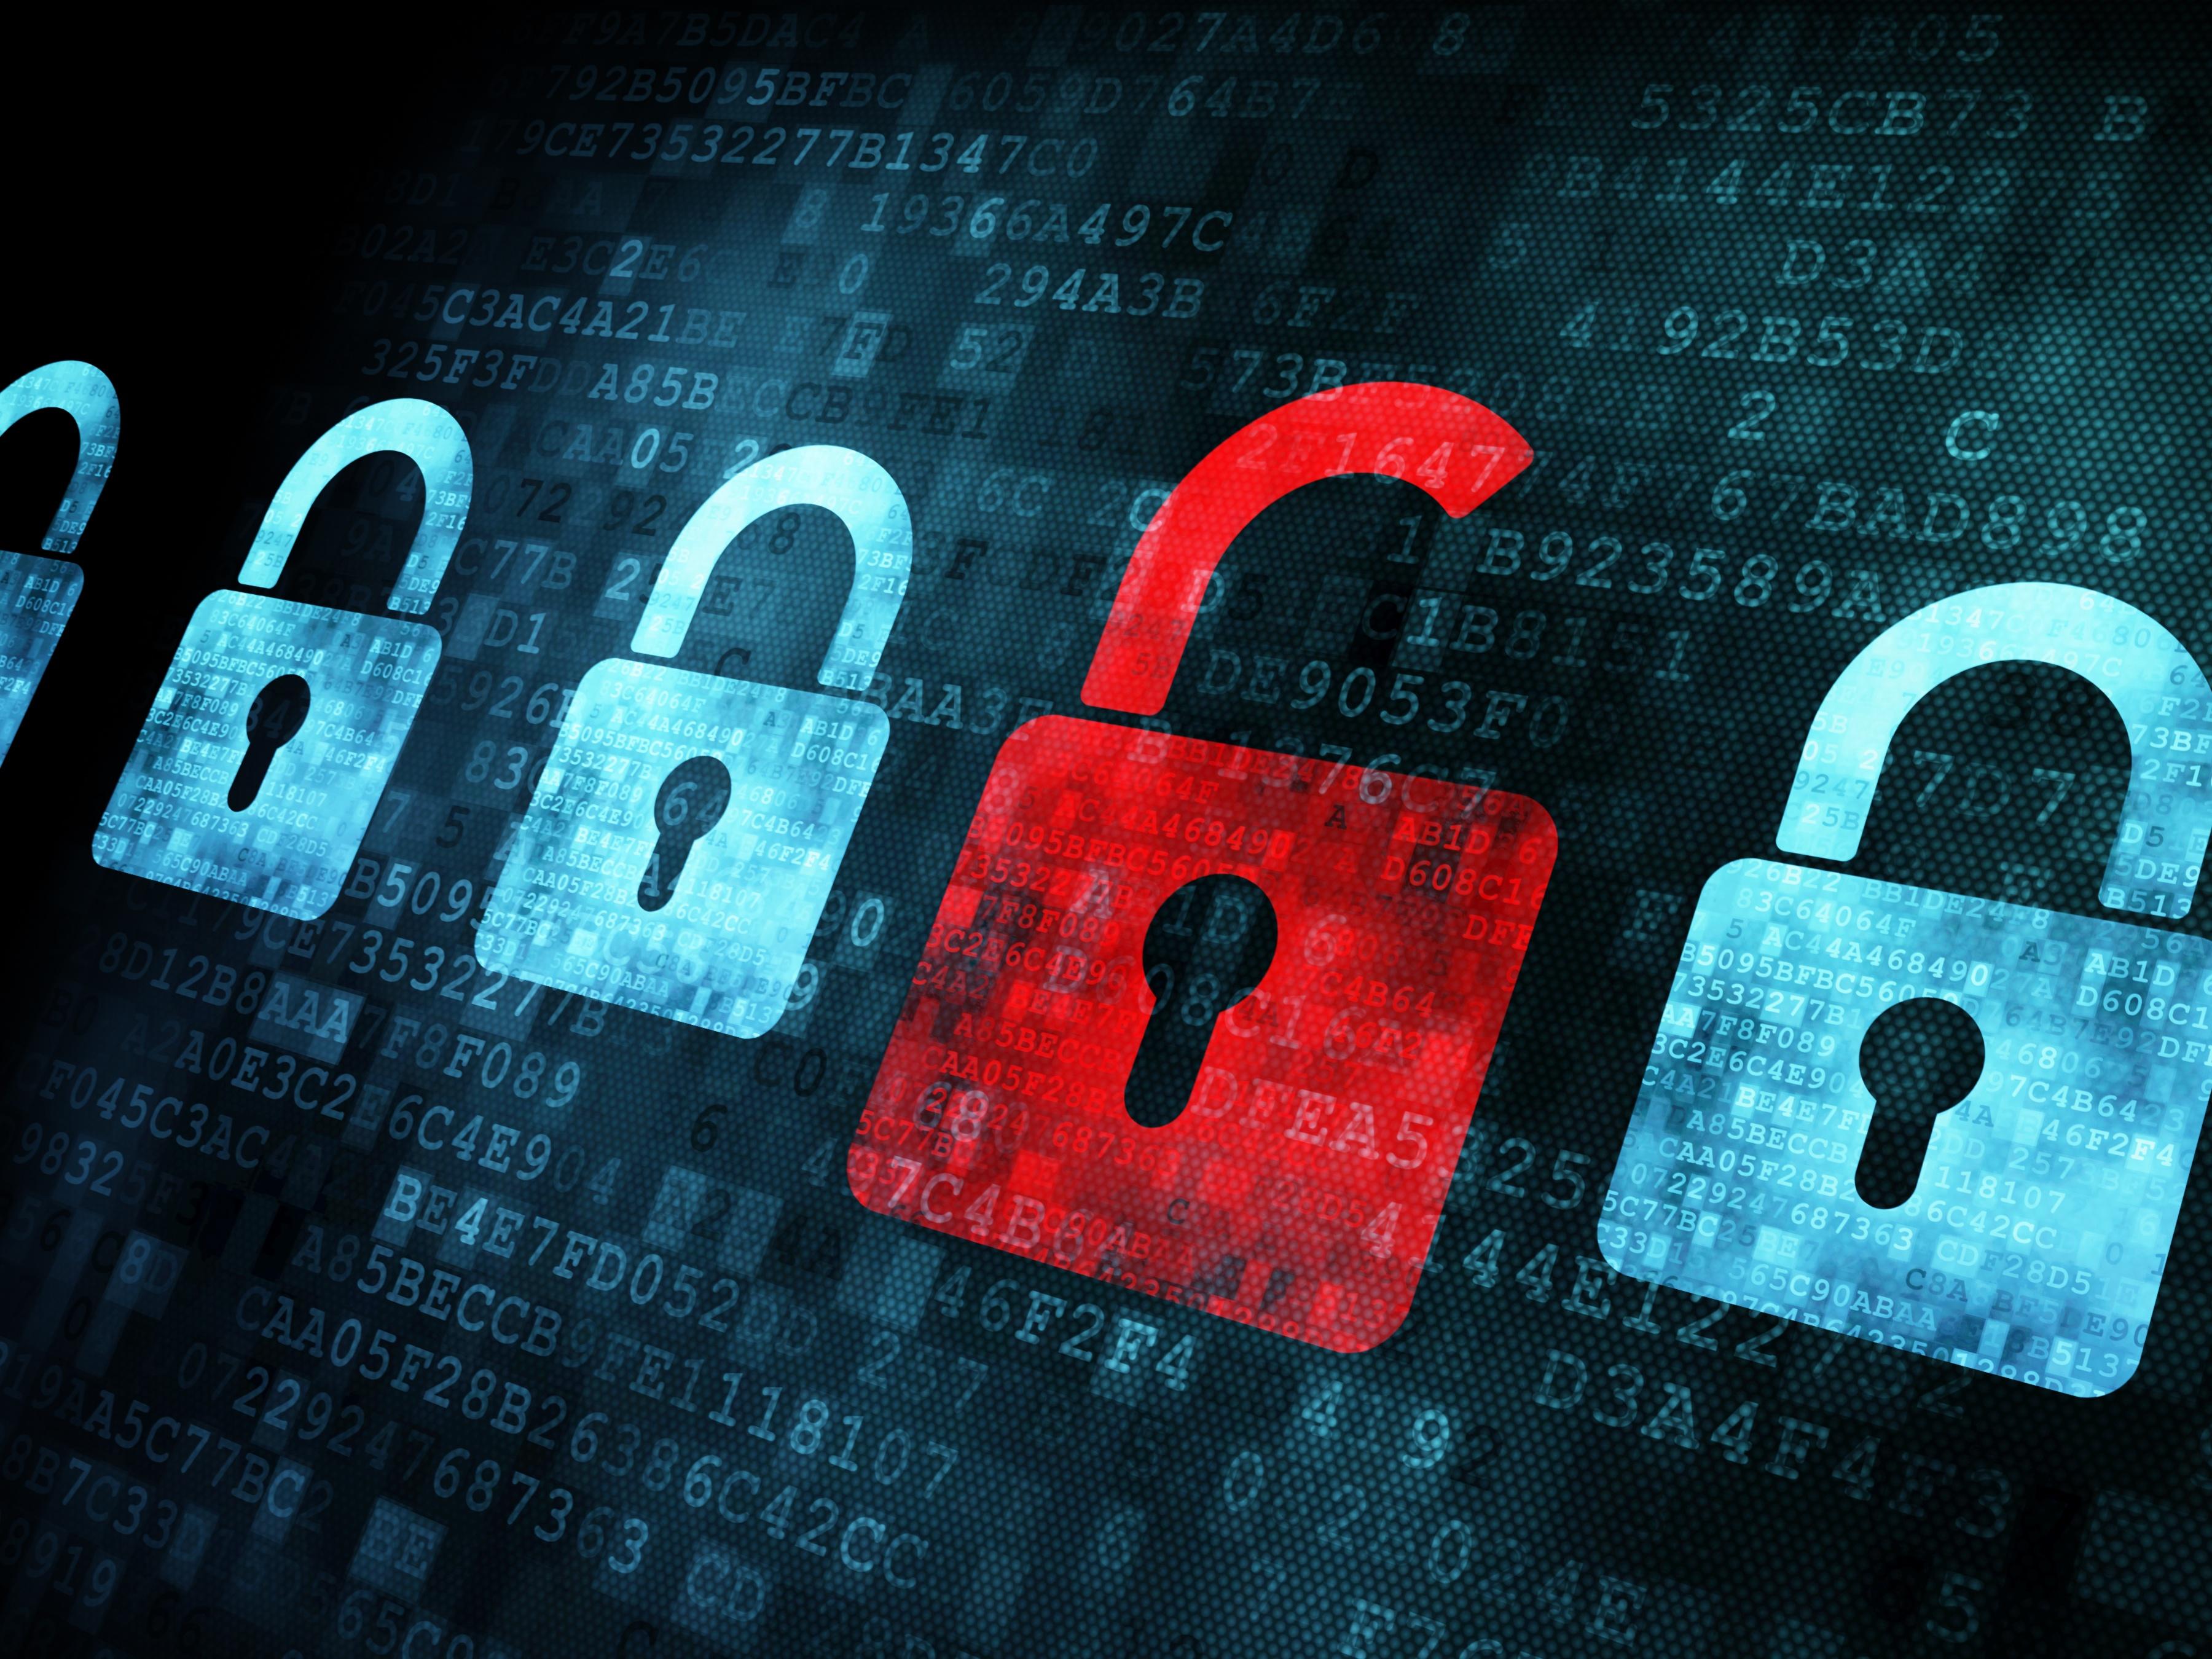 password manager - enterprise password management software - header